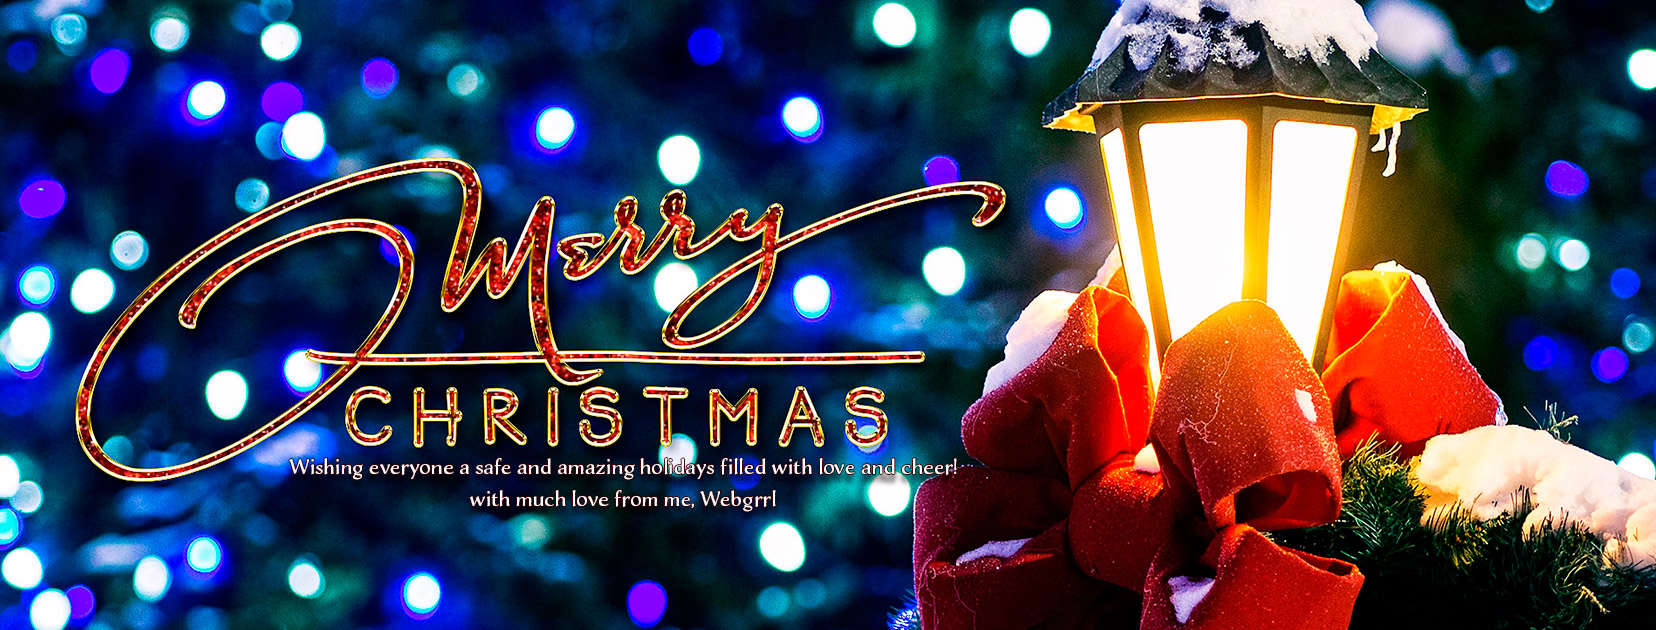 11. #30HappyWords  ❤  Merry Christmas